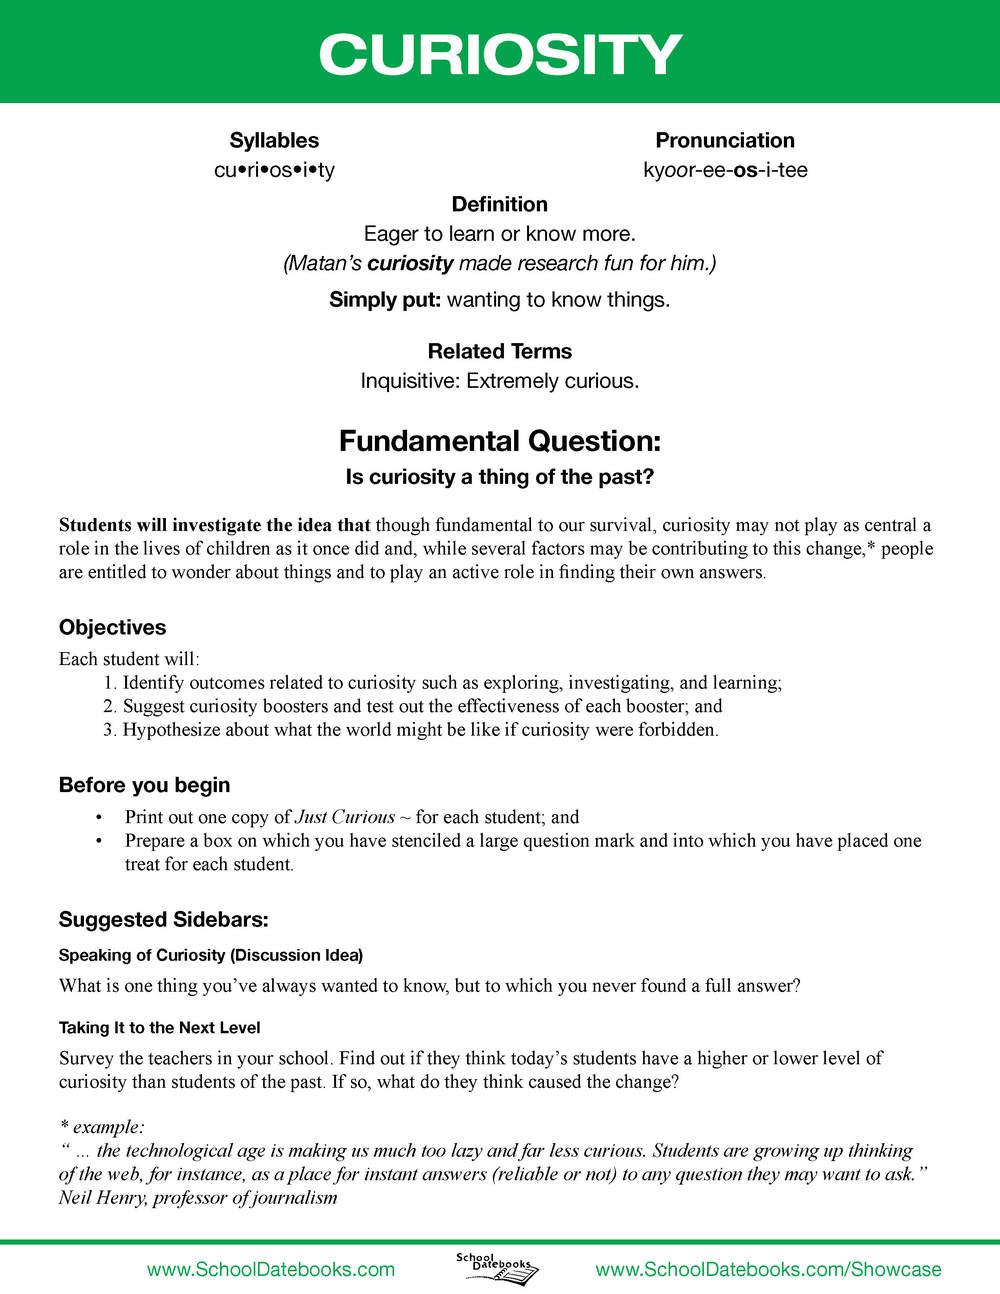 LessonPlan-Curiosity_Page_1.jpg